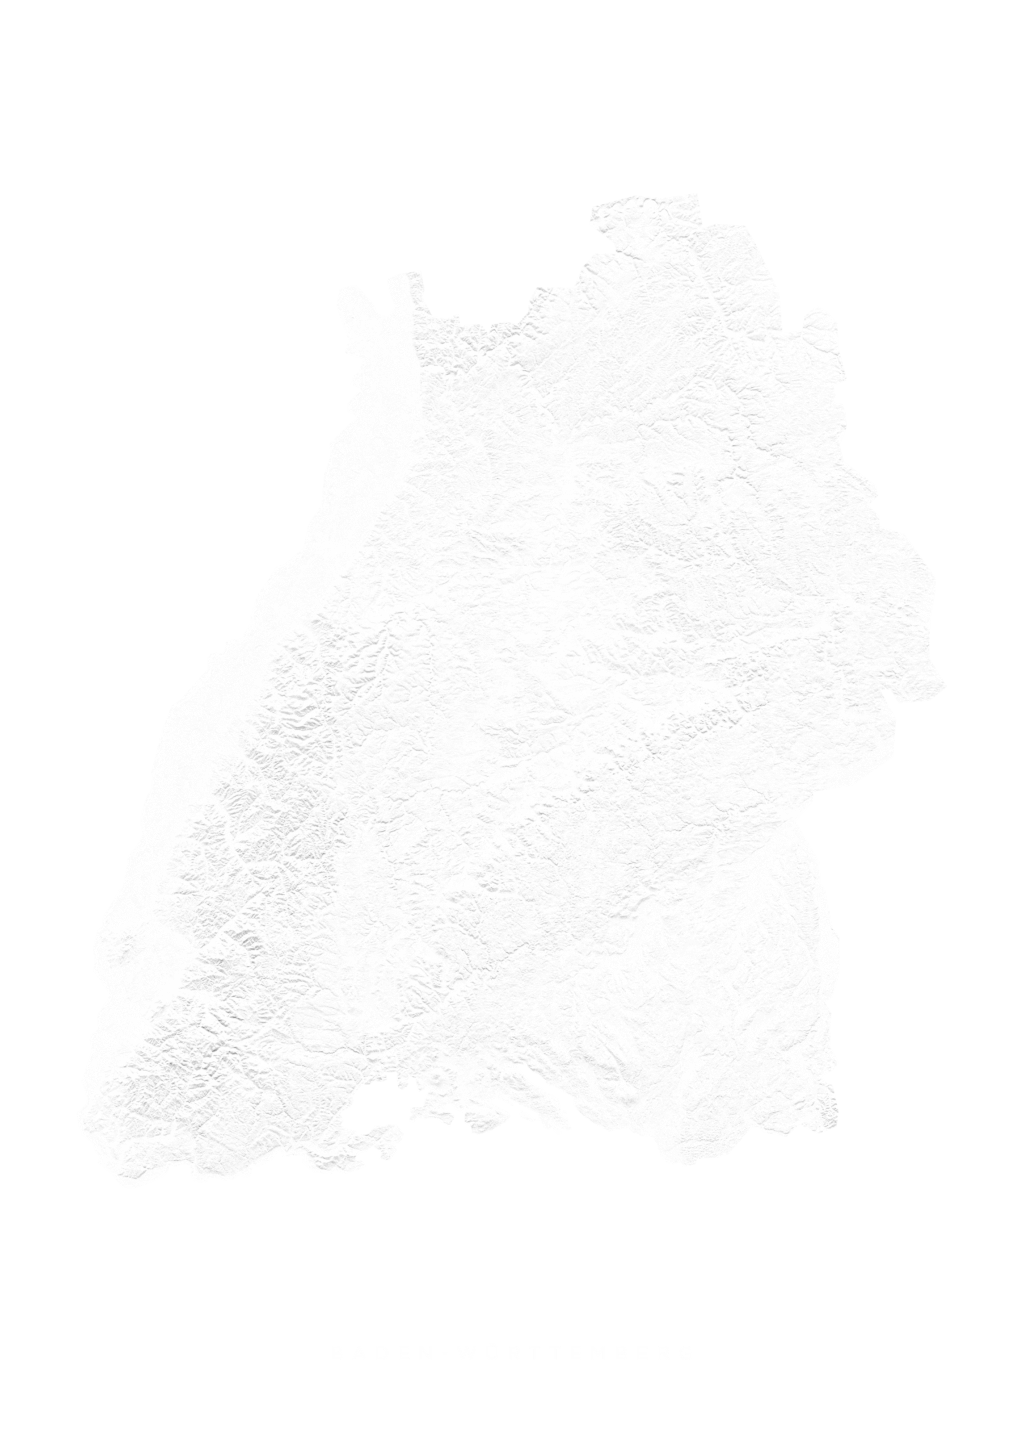 Baden WÜrttemberg wall map